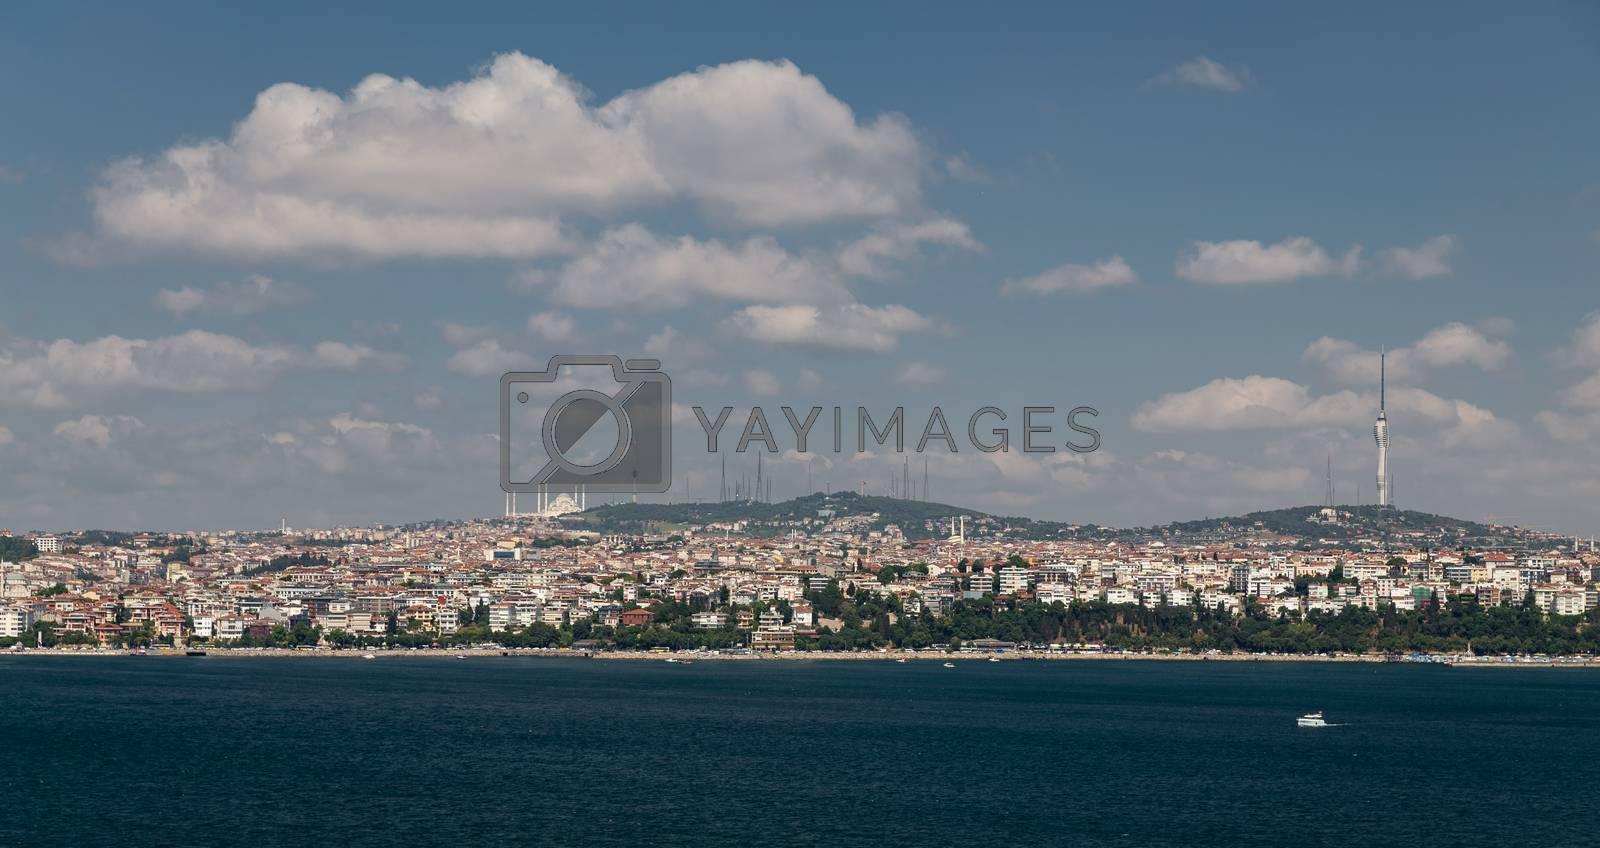 Bosphorus Strait and Uskudar District in Istanbul City, Turkey